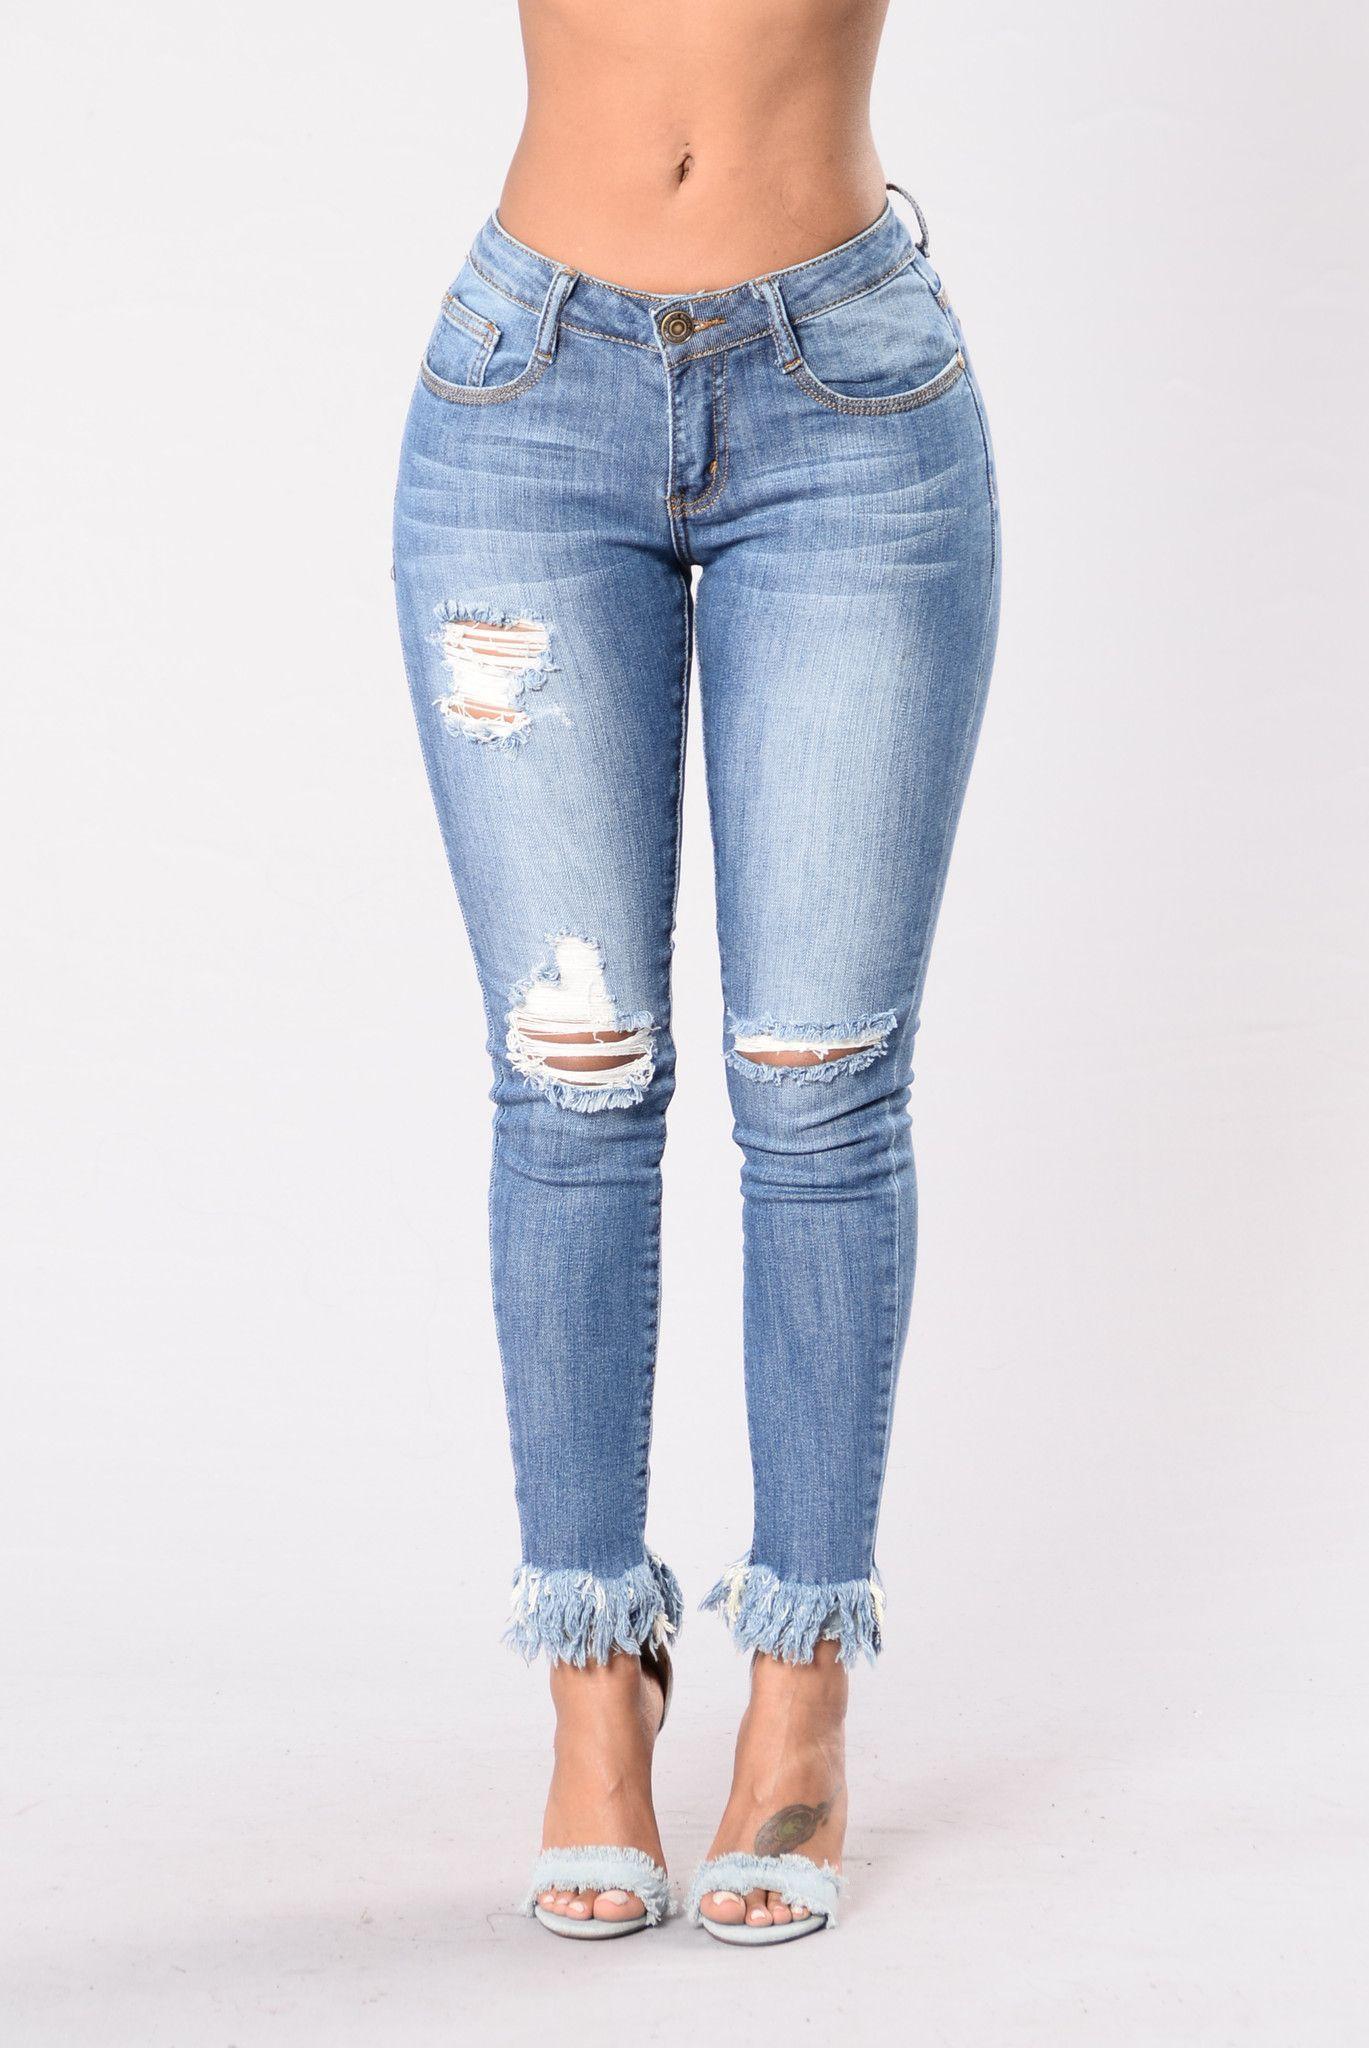 Shy Girl Jeans - Medium